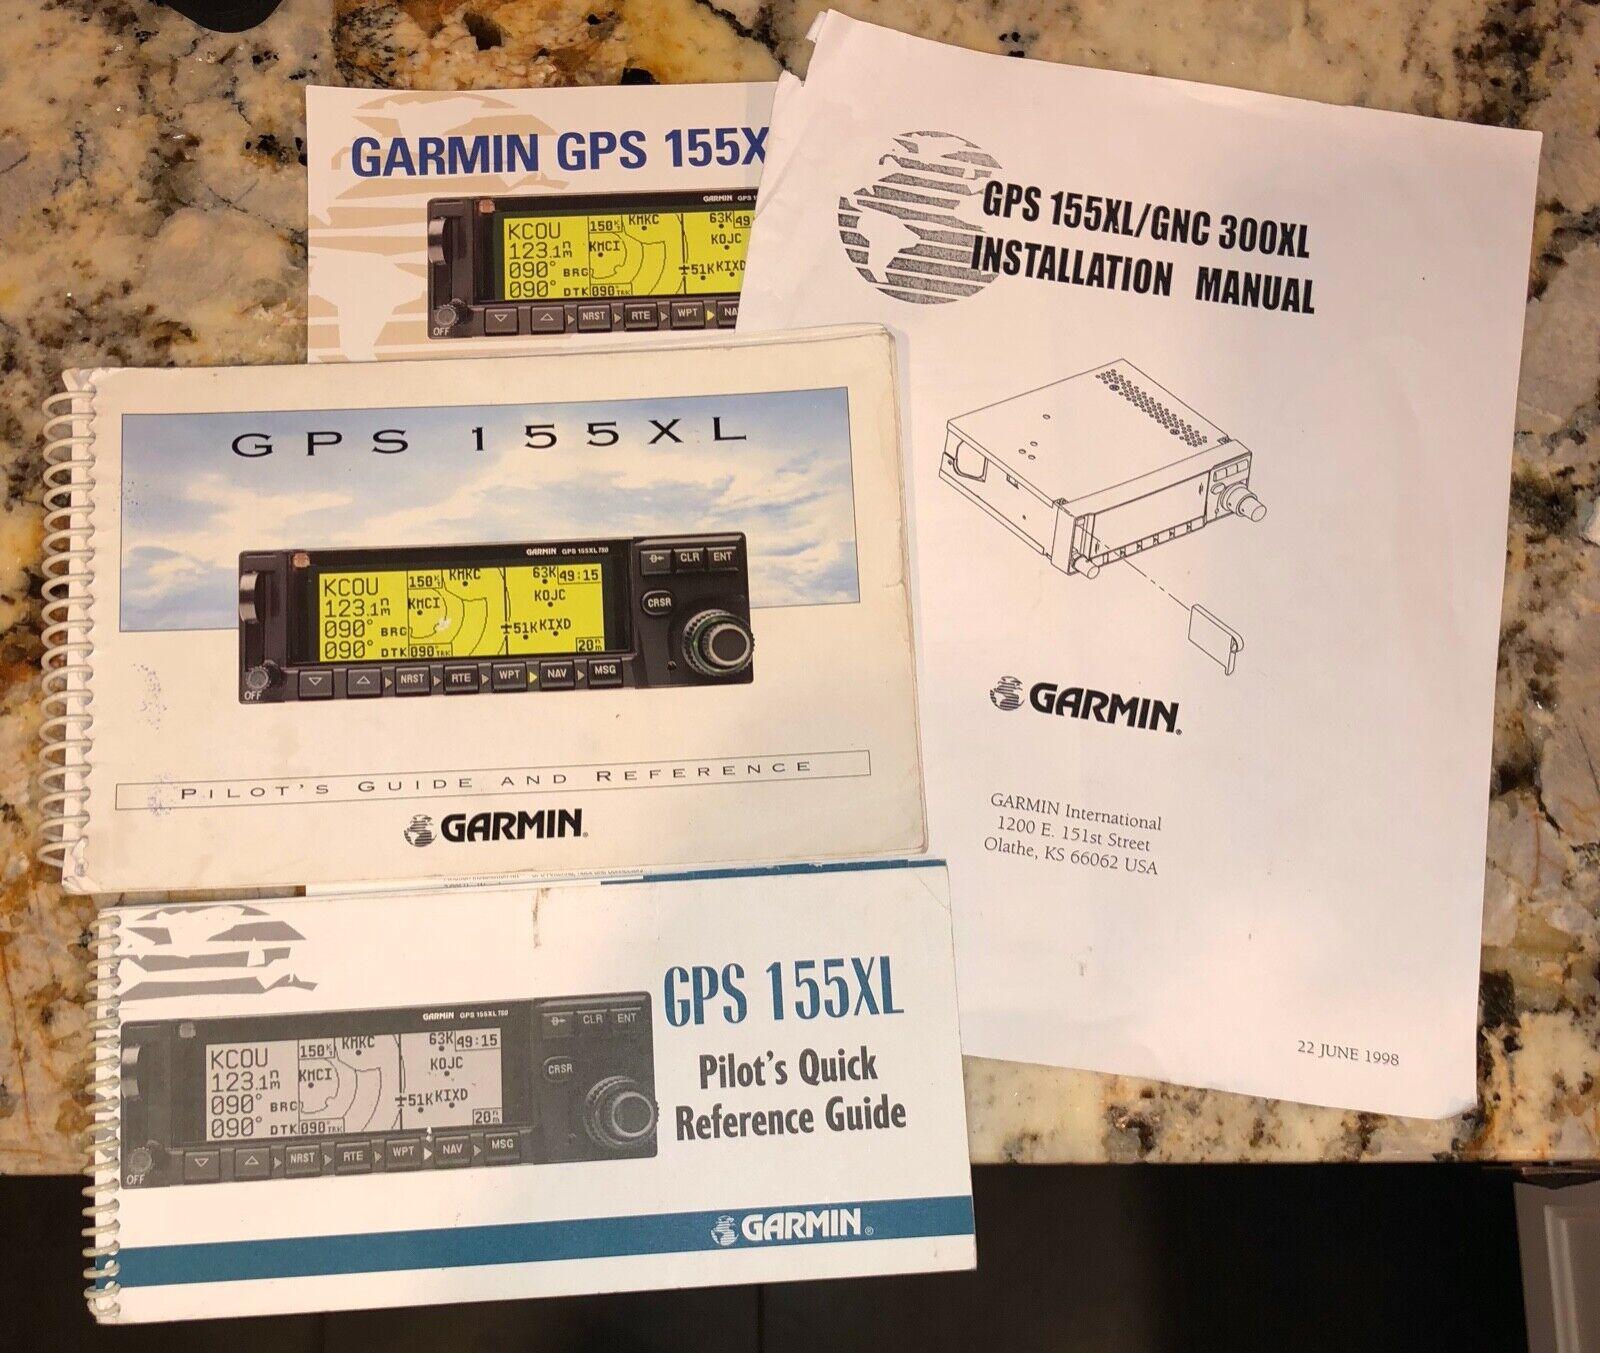 Garmin IFR GPS155XL PN: 011-00412-00 SN: 95000205